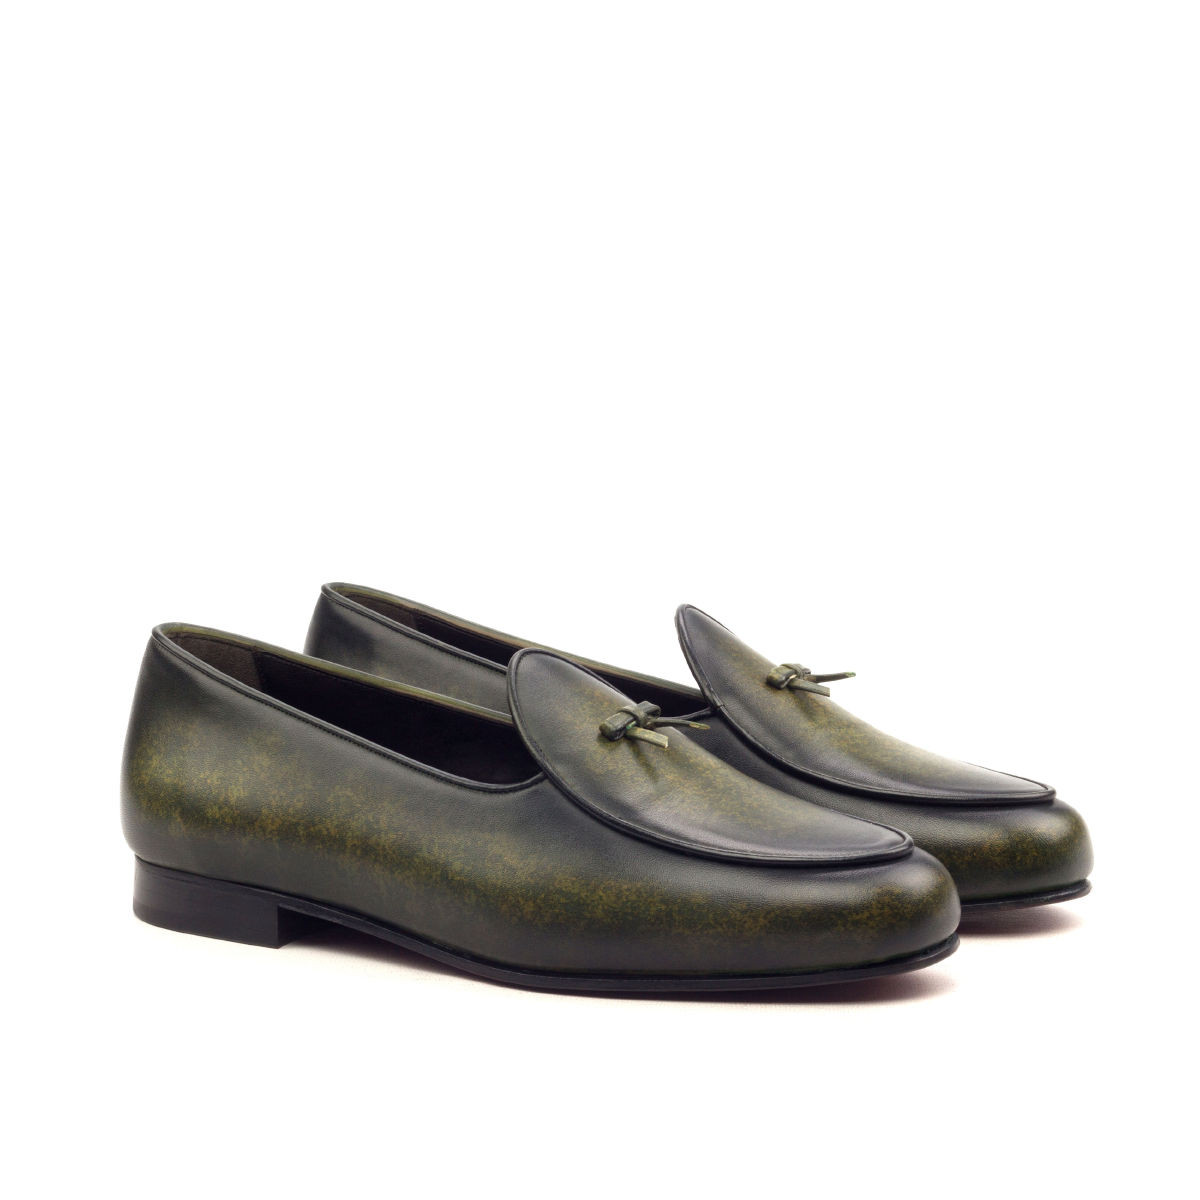 Green Patina Belgian Slipper